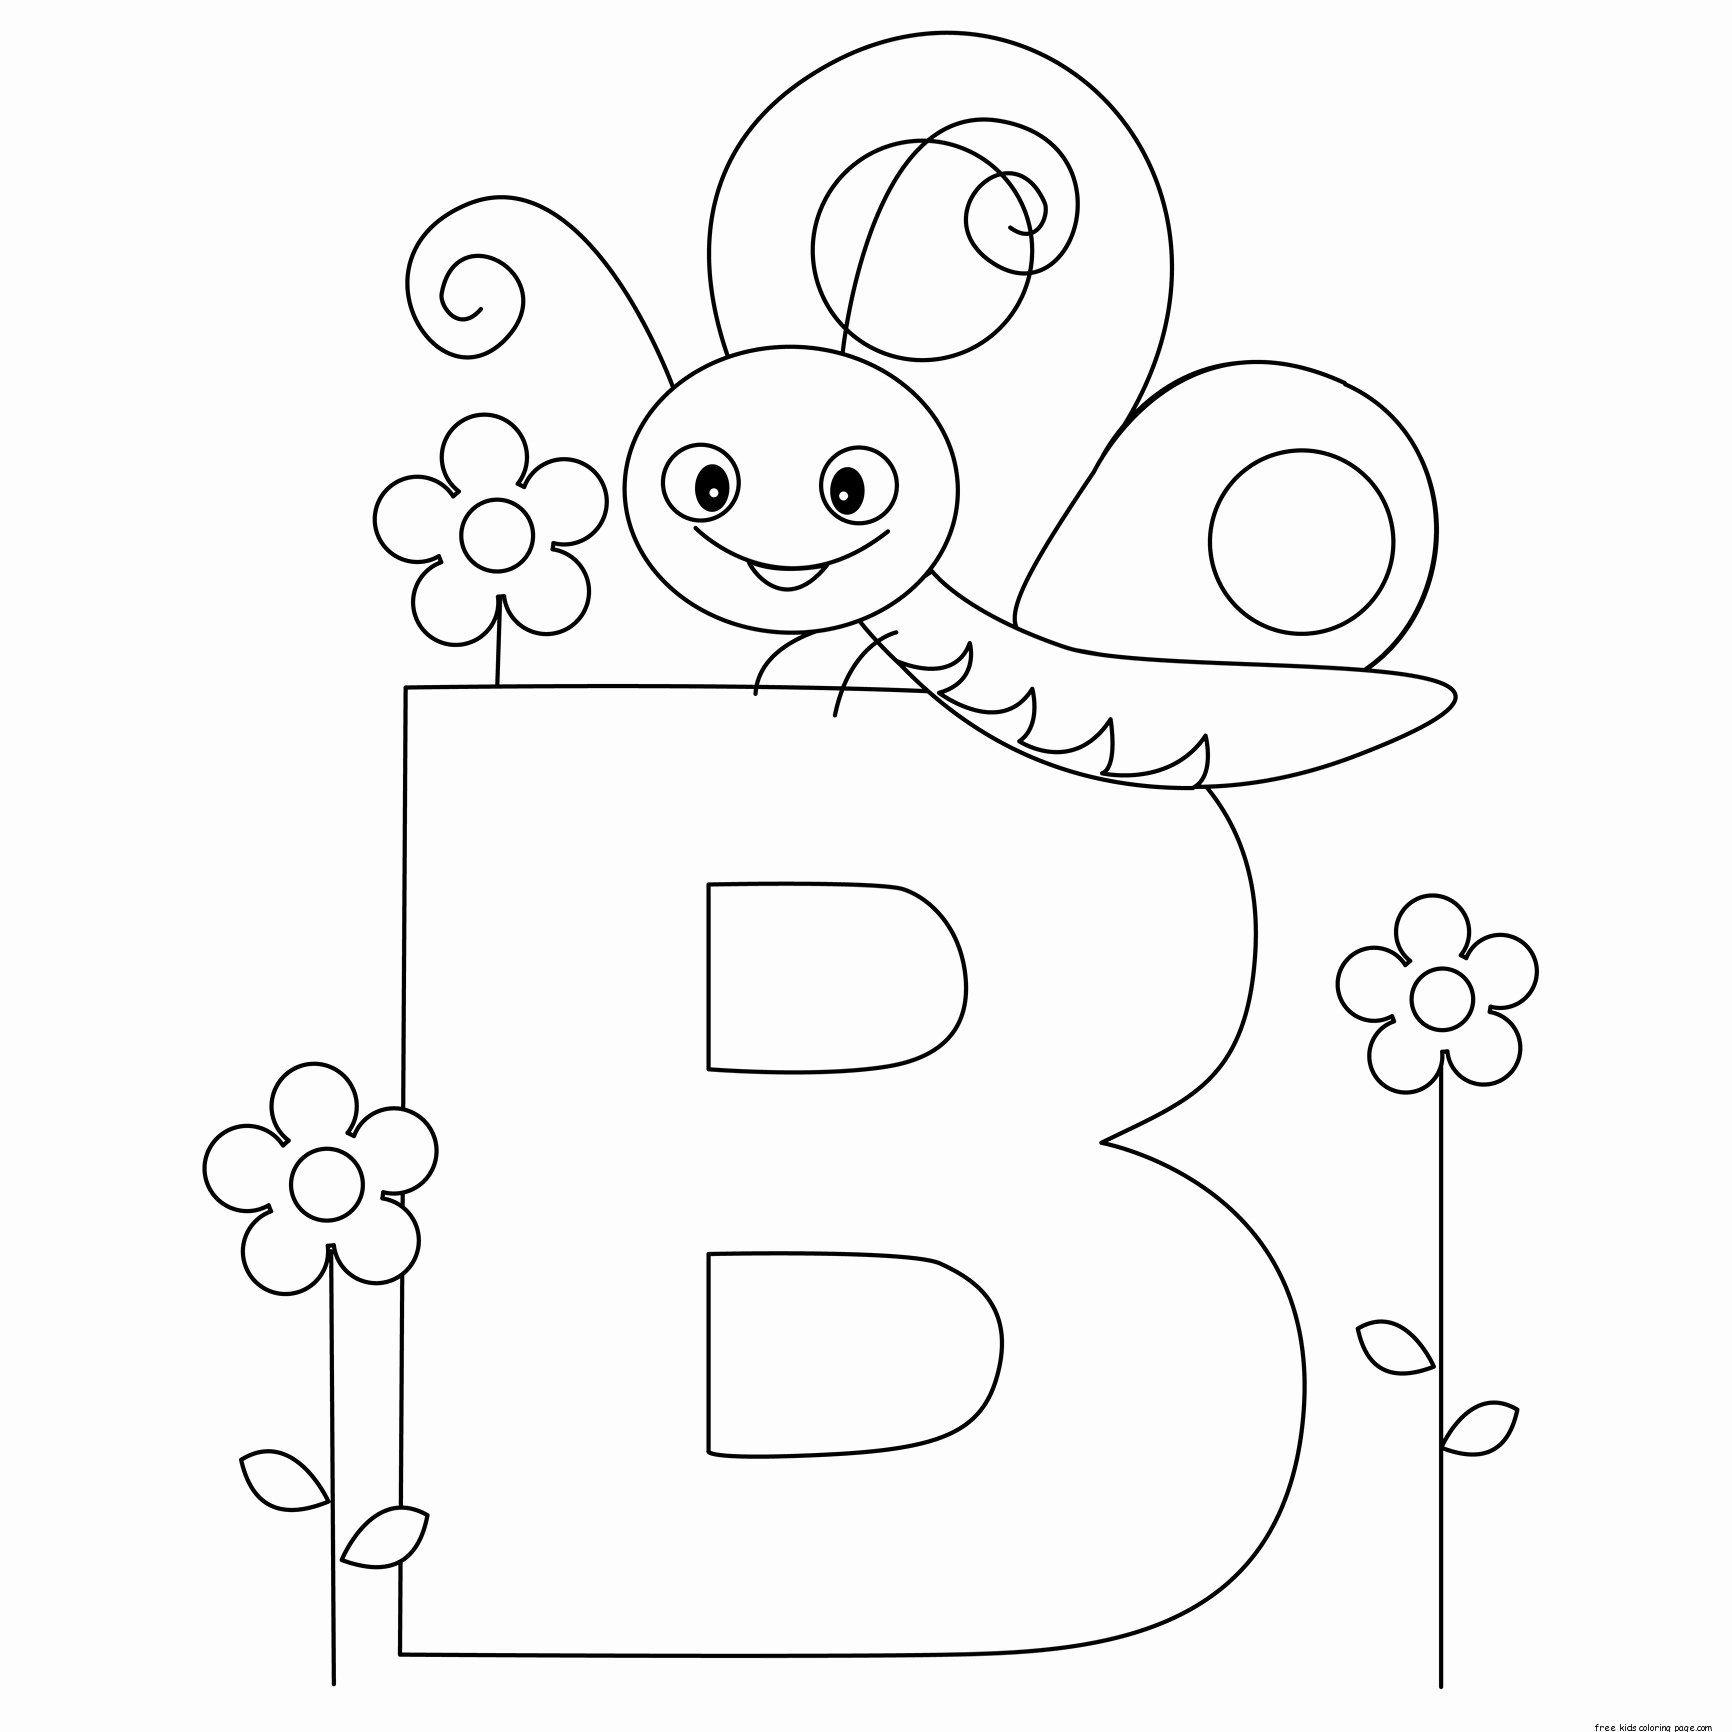 Alphabet Coloring Pages Printable Free Viati Coloring Abc Coloring Pages Kindergarten Coloring Pages Bug Coloring Pages